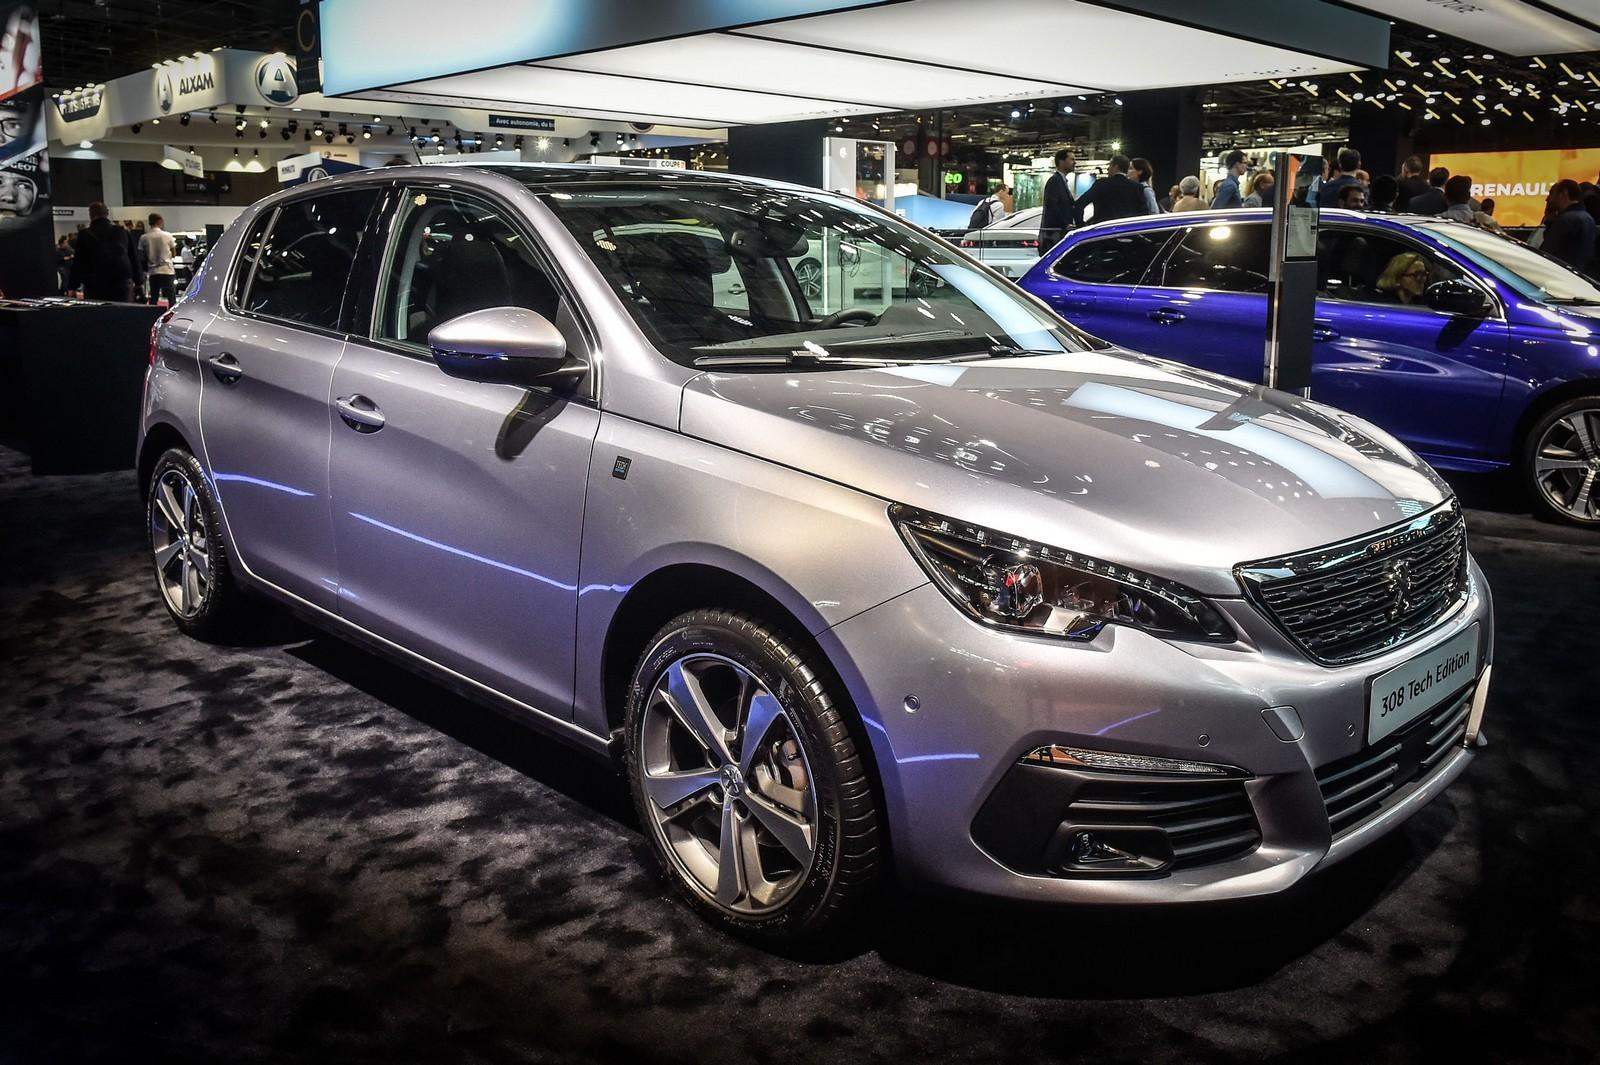 Nuova Peugeot 308 Tech Edition